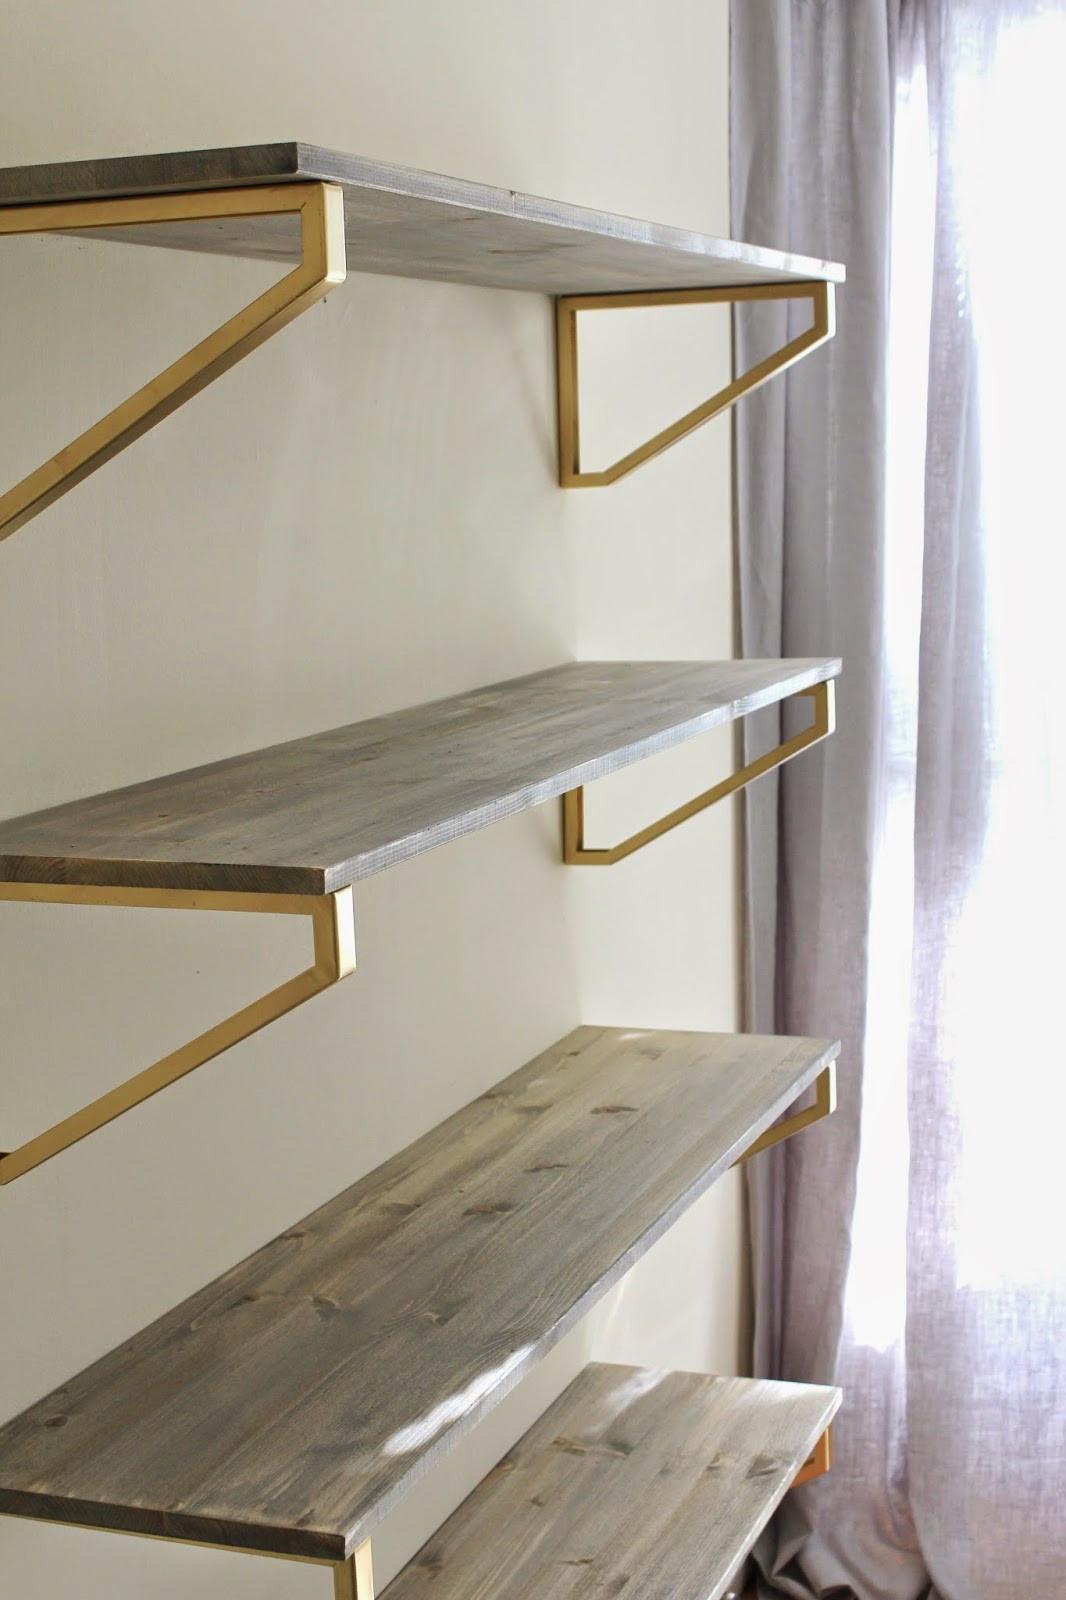 DIY Wood Shelf  Cup Half Full Rustic Wood Shelf DIY